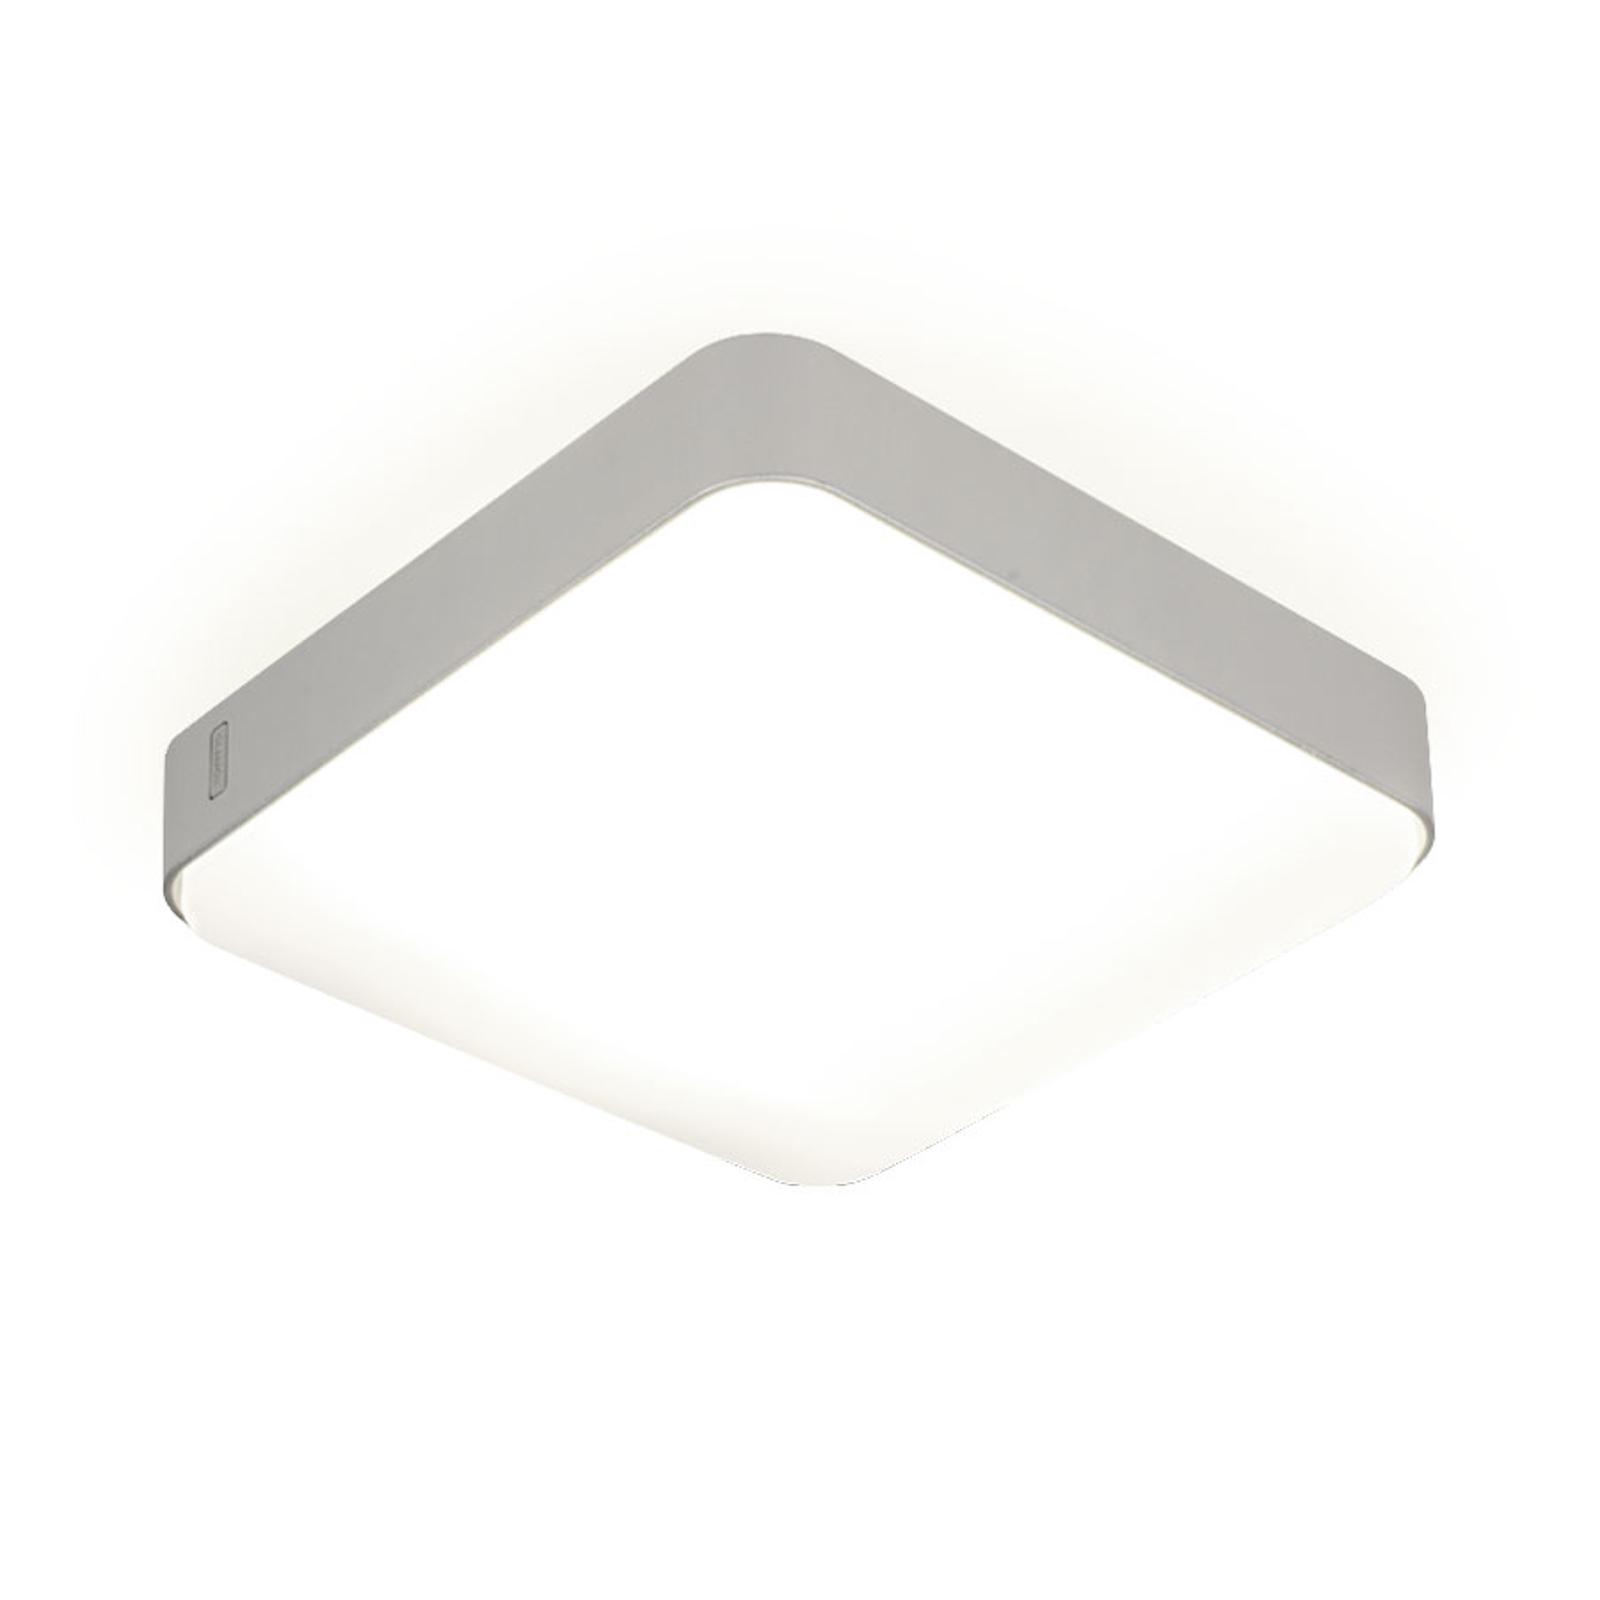 Lampa sufitowa LED A20-SQ, 30x30 cm, 3000K